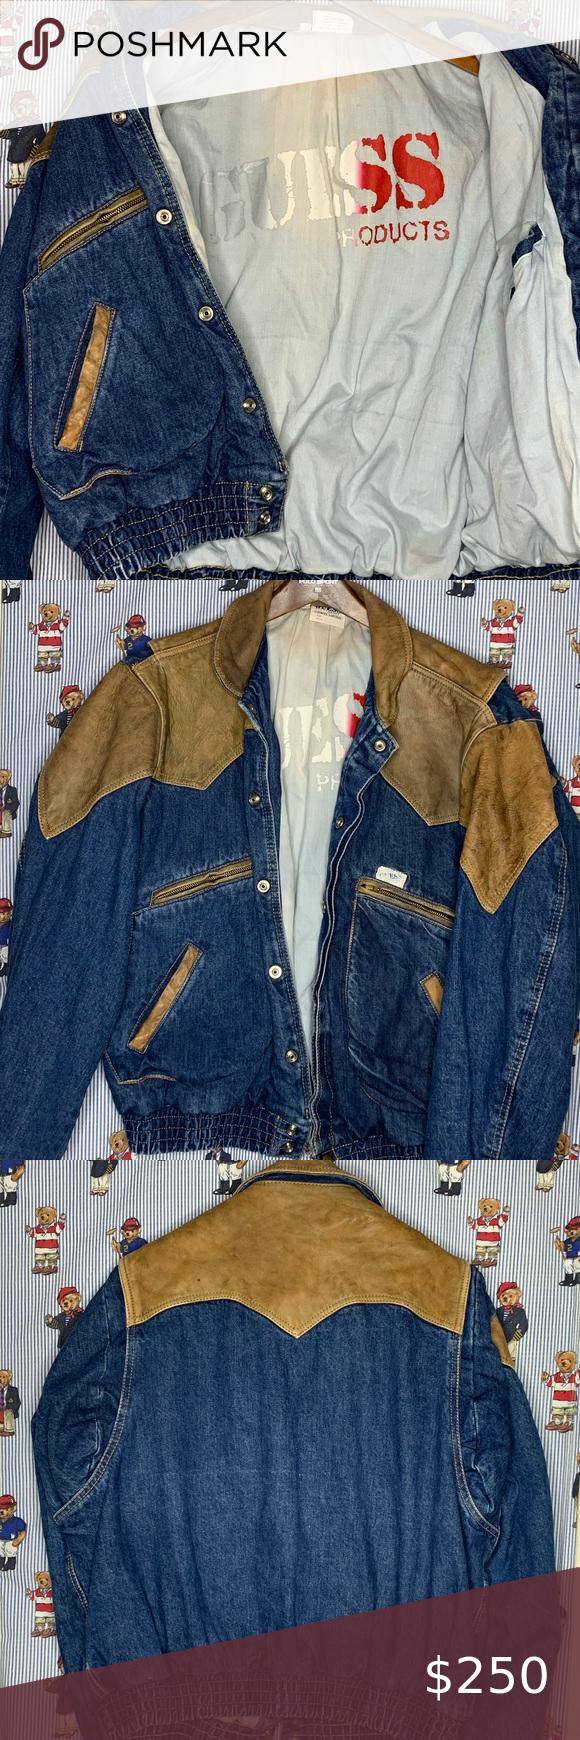 Vintage 80s Guess Leather Denim Jacket Marty Mcfly Leather Denim Denim Jacket Jackets [ 1740 x 580 Pixel ]